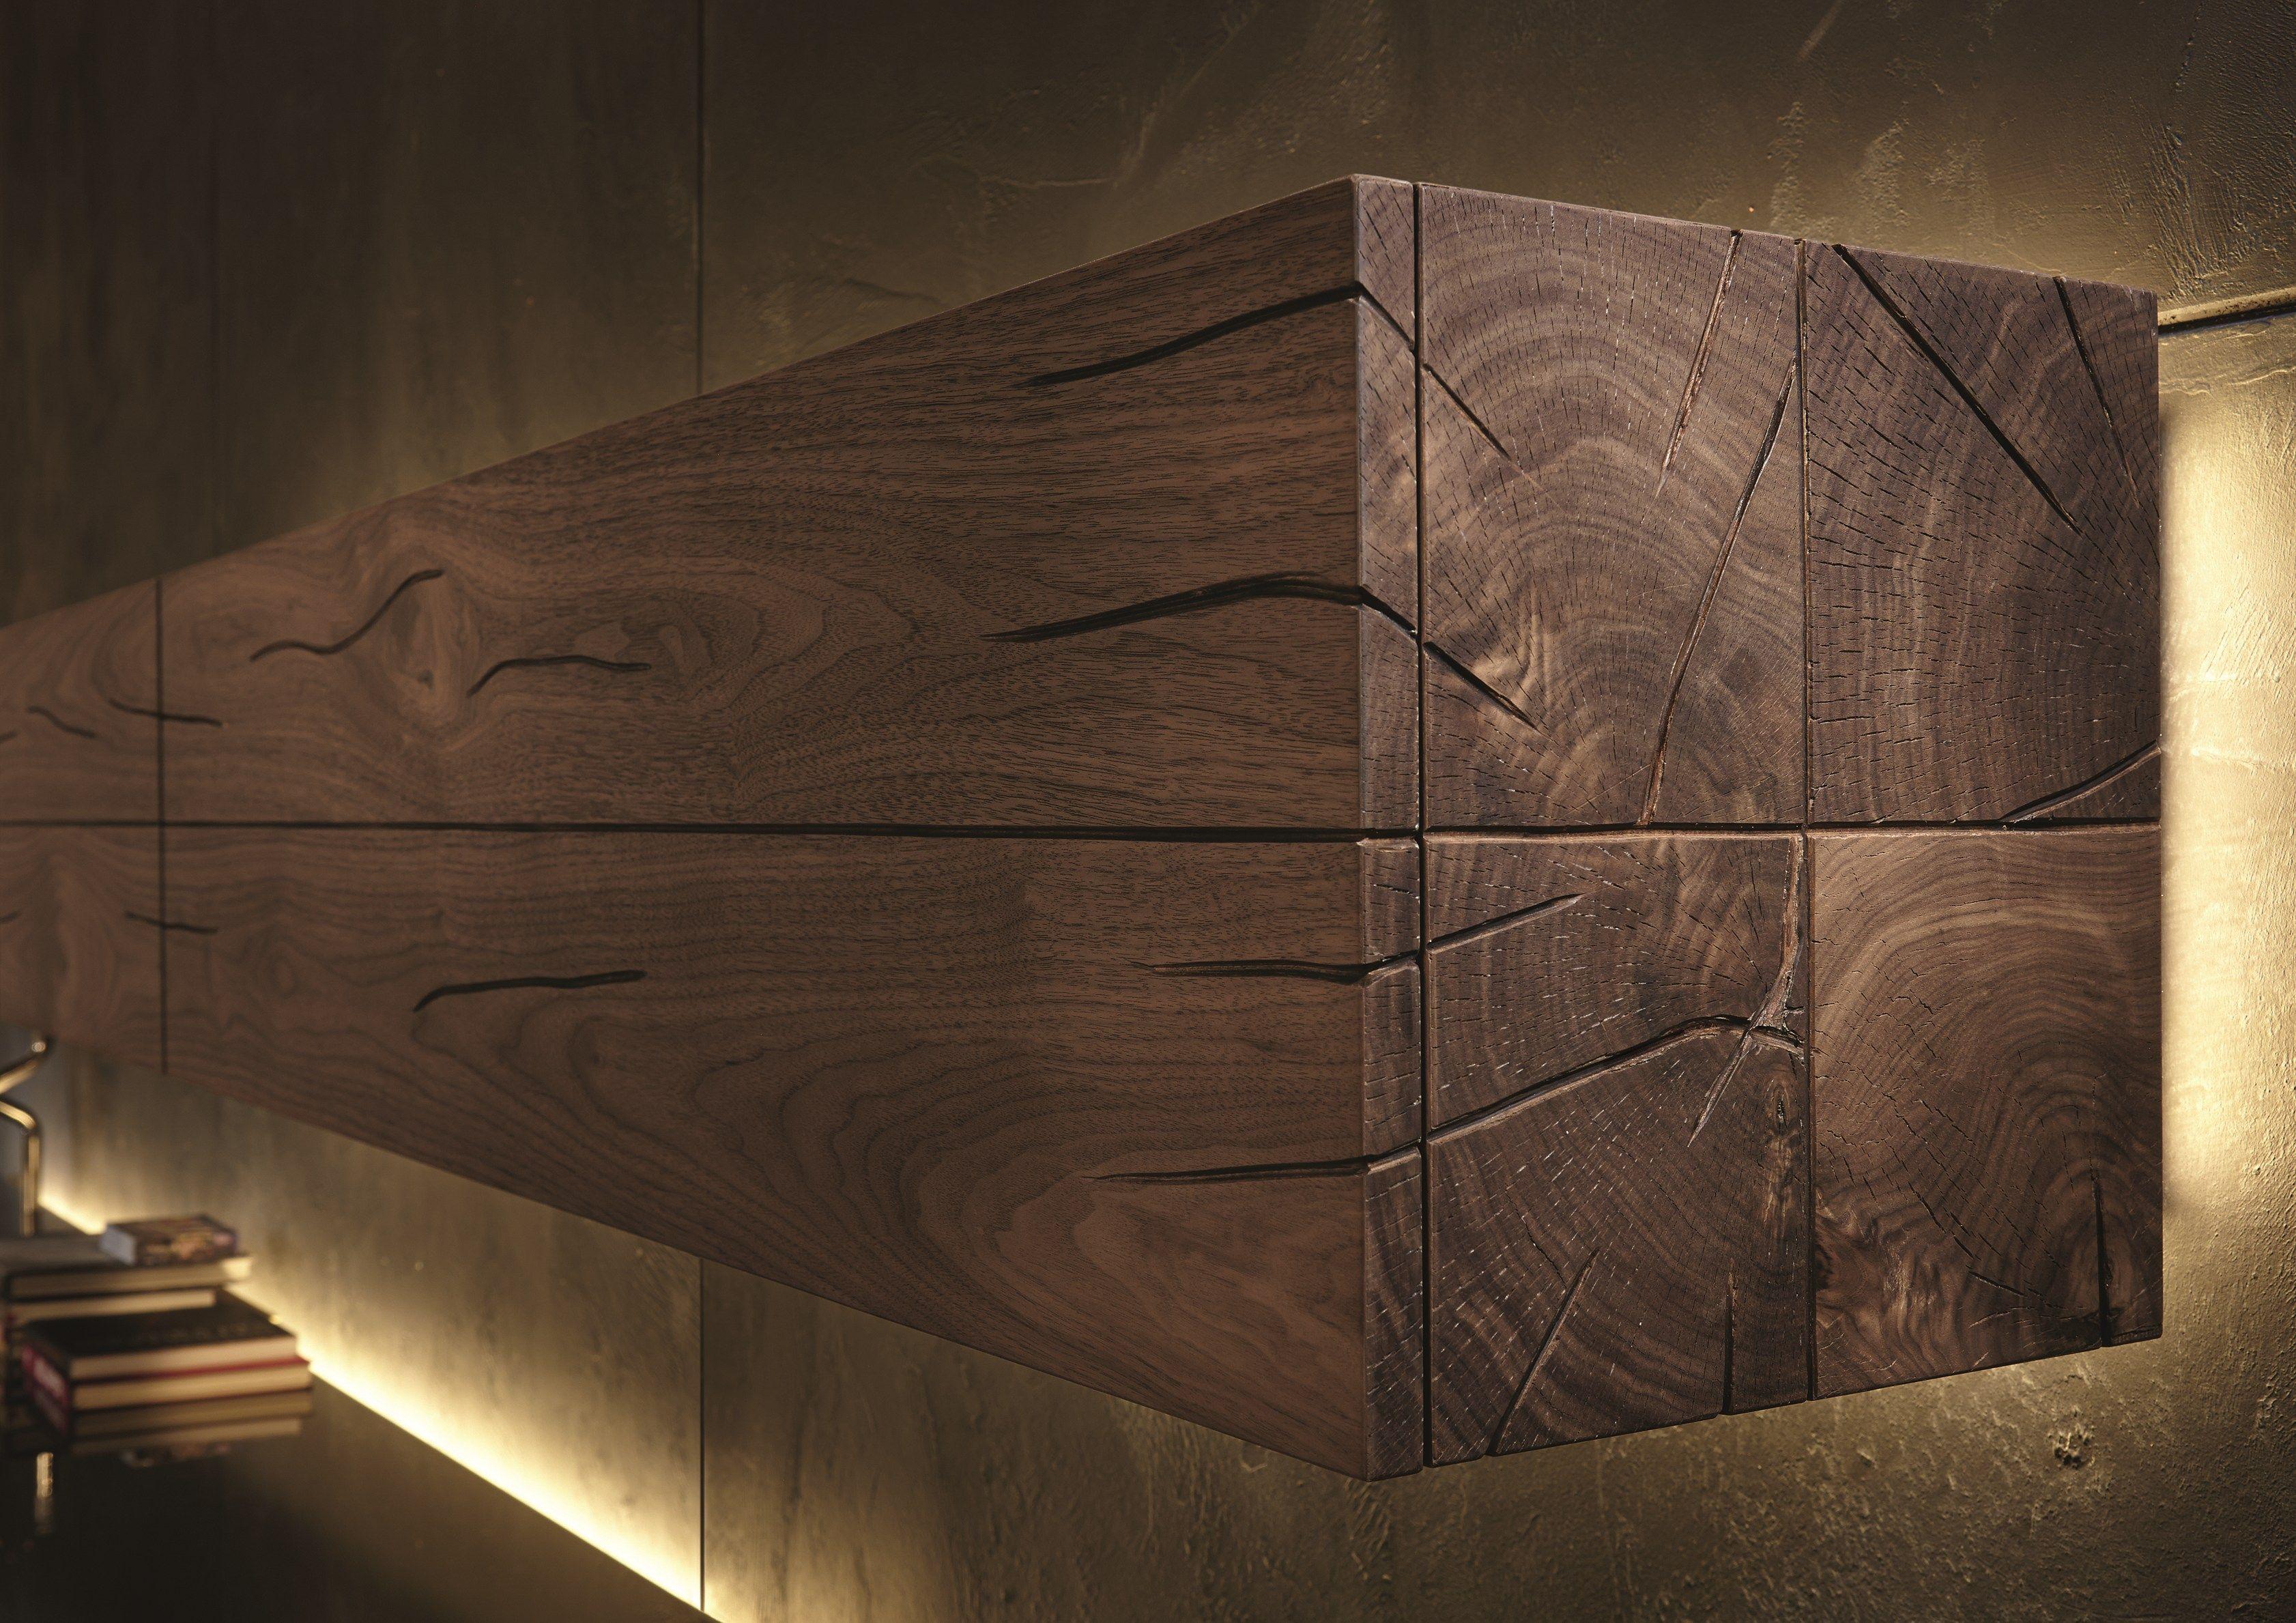 Wohnwand Beleuchtung Kabel : Wohnwand Hulsta Gentis  Anbau lackierte Wohnwand aus massivem Holz